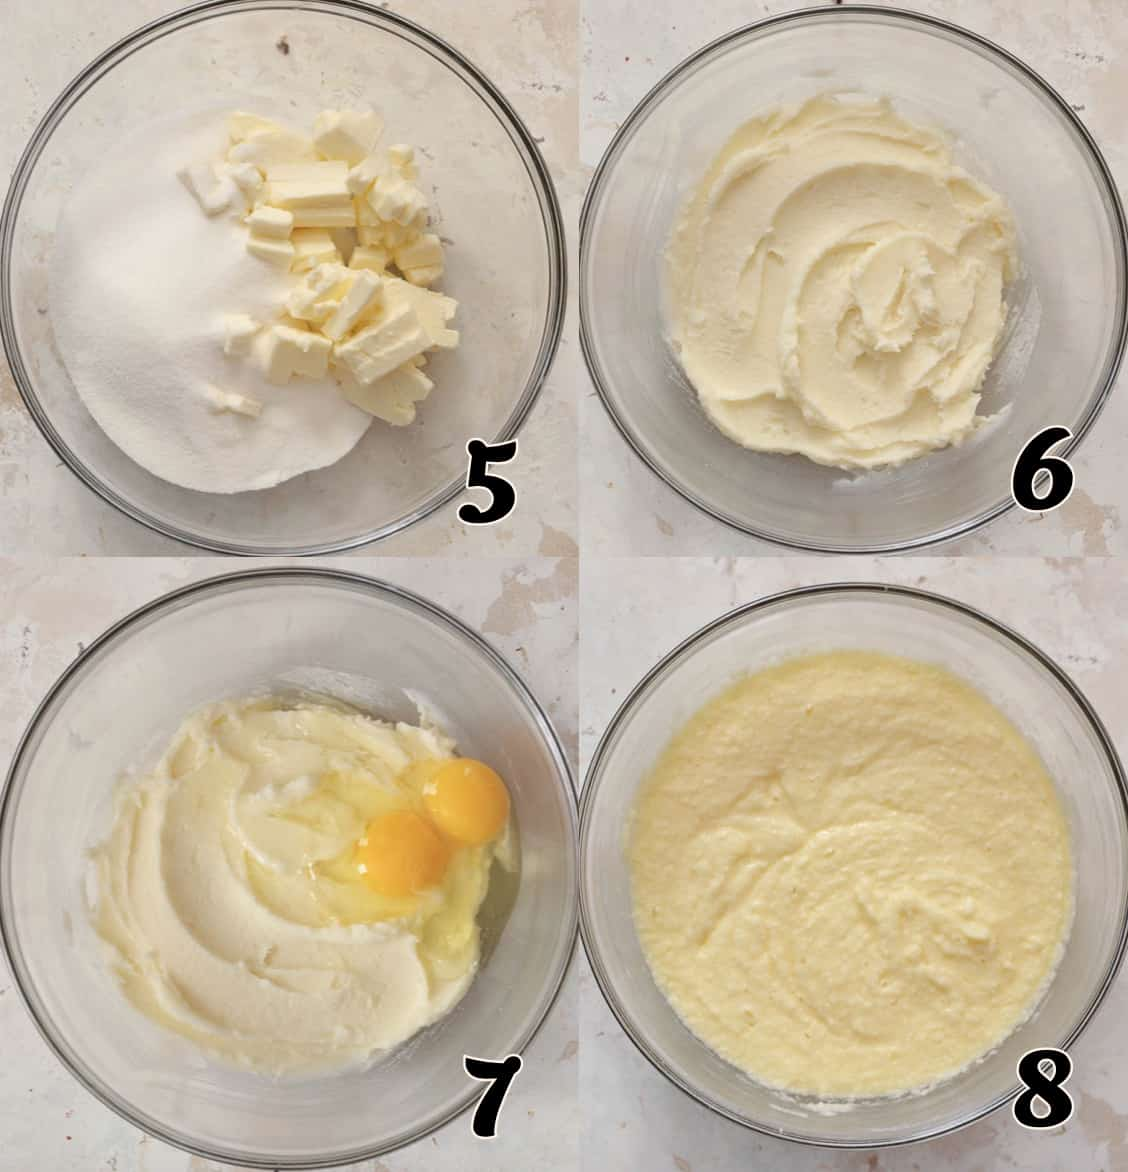 Making the Pound Cake Batter